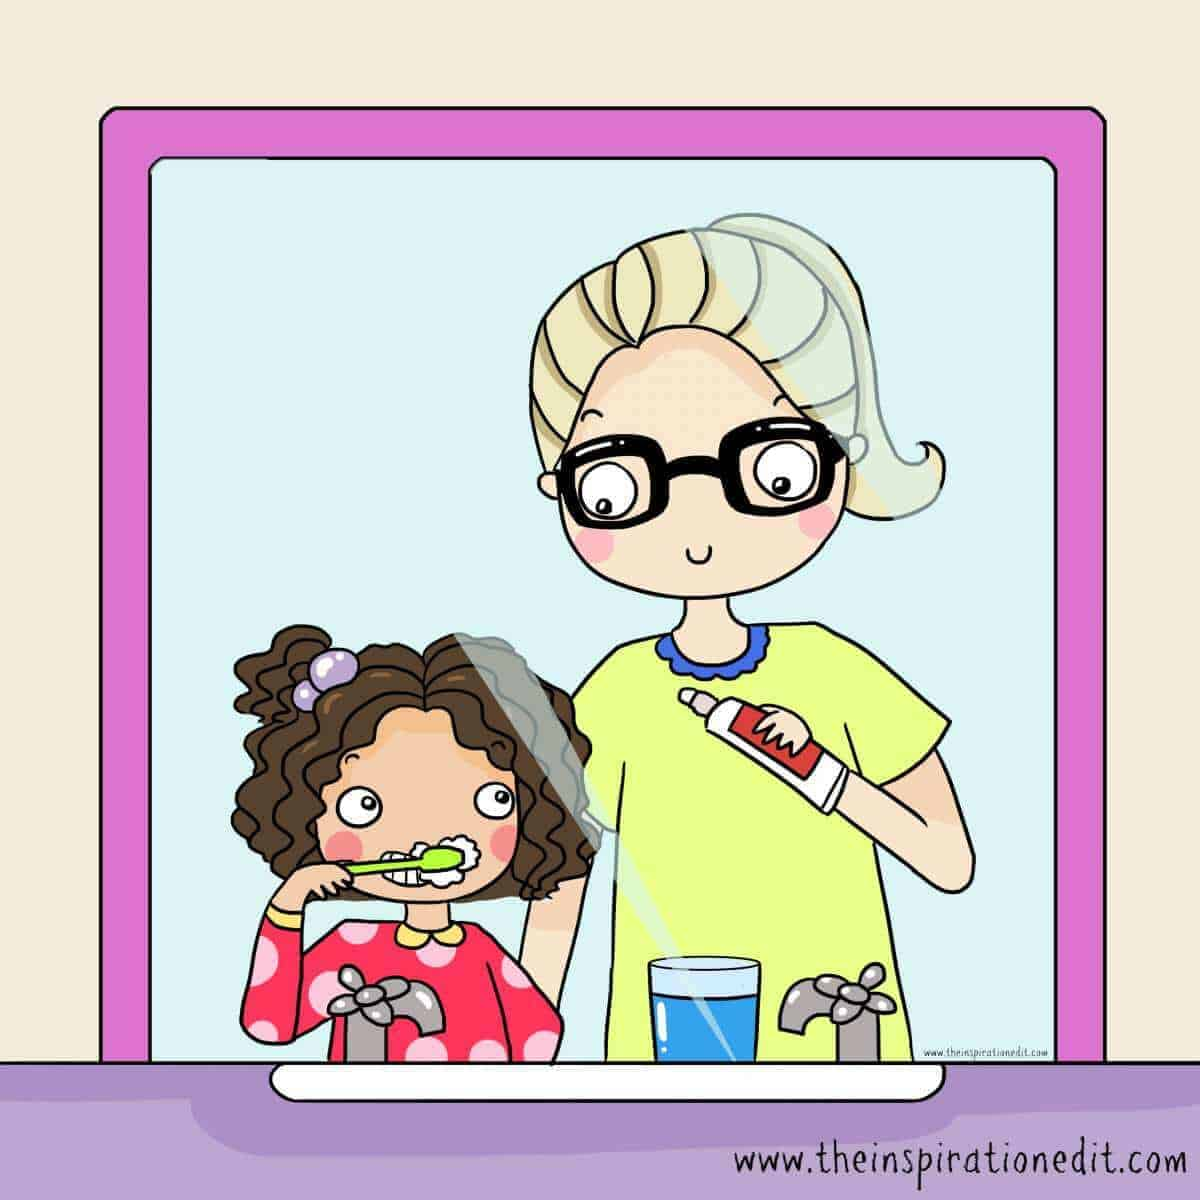 teach kids to brush teeth